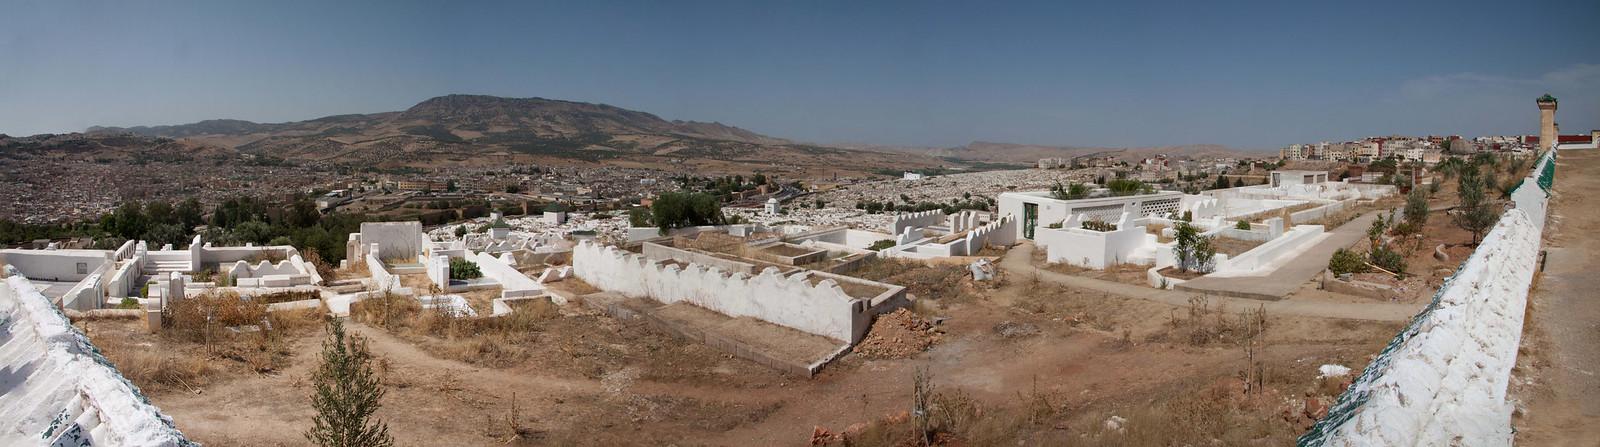 Marokko 2015-07_148p